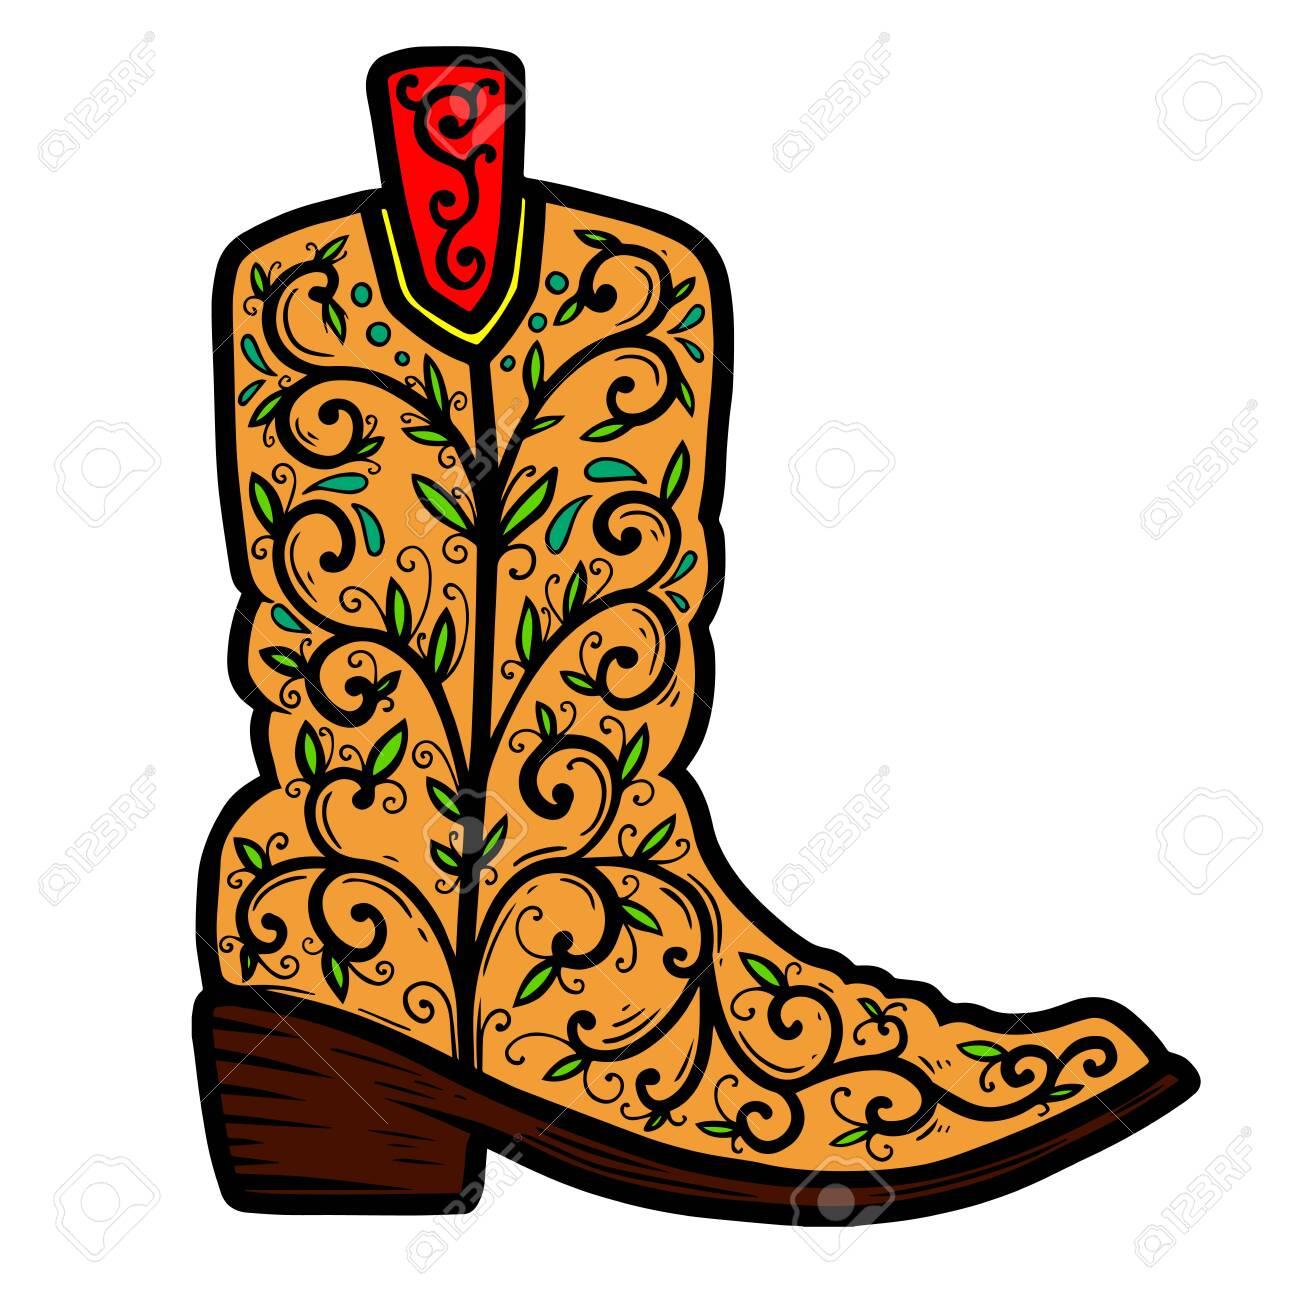 Cowboy boot with floral pattern. Design element for poster, t shirt, emblem, sign. - 125980960